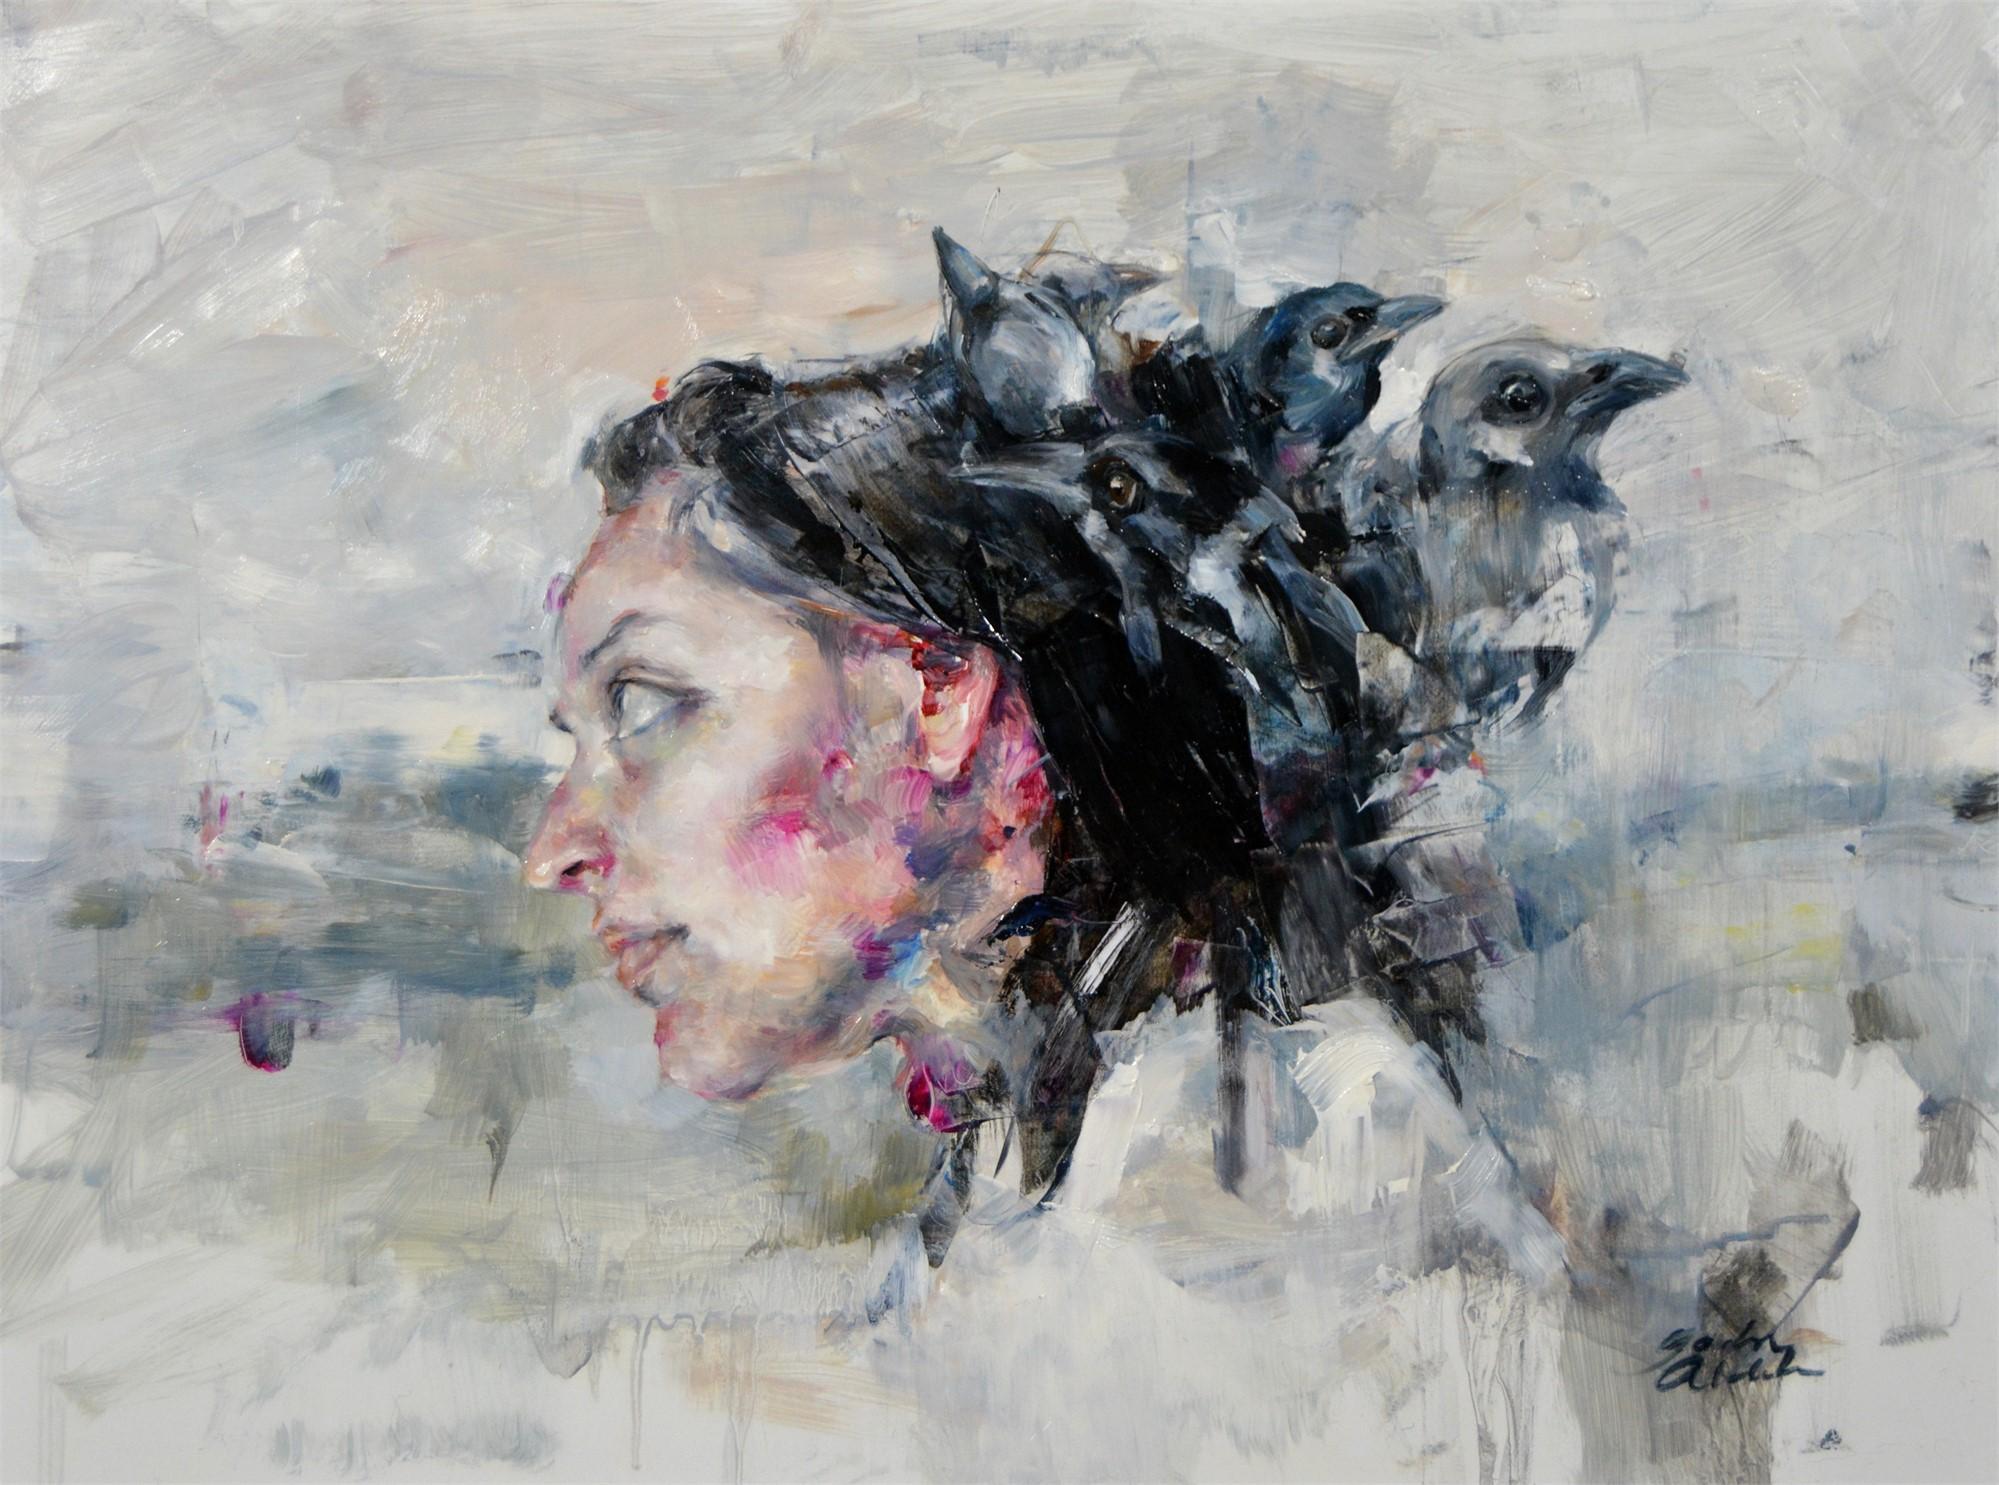 Cerebral Congregation by Jaclyn Alderete